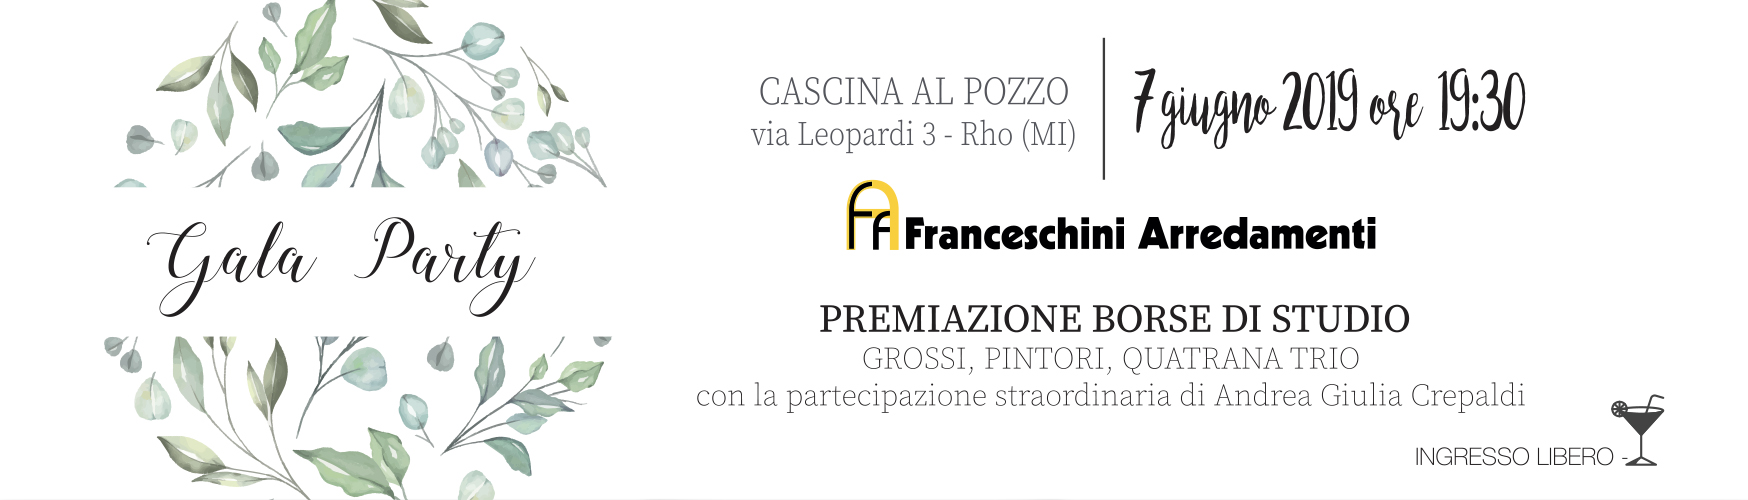 Accademia Musicale Crepaldi - Gala Party 2019